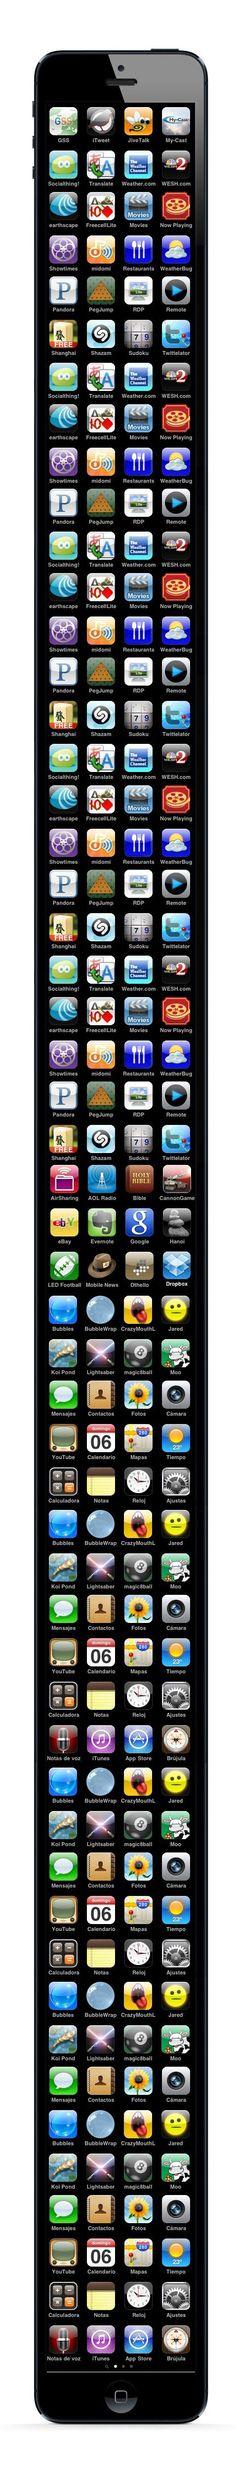 iPhone 50